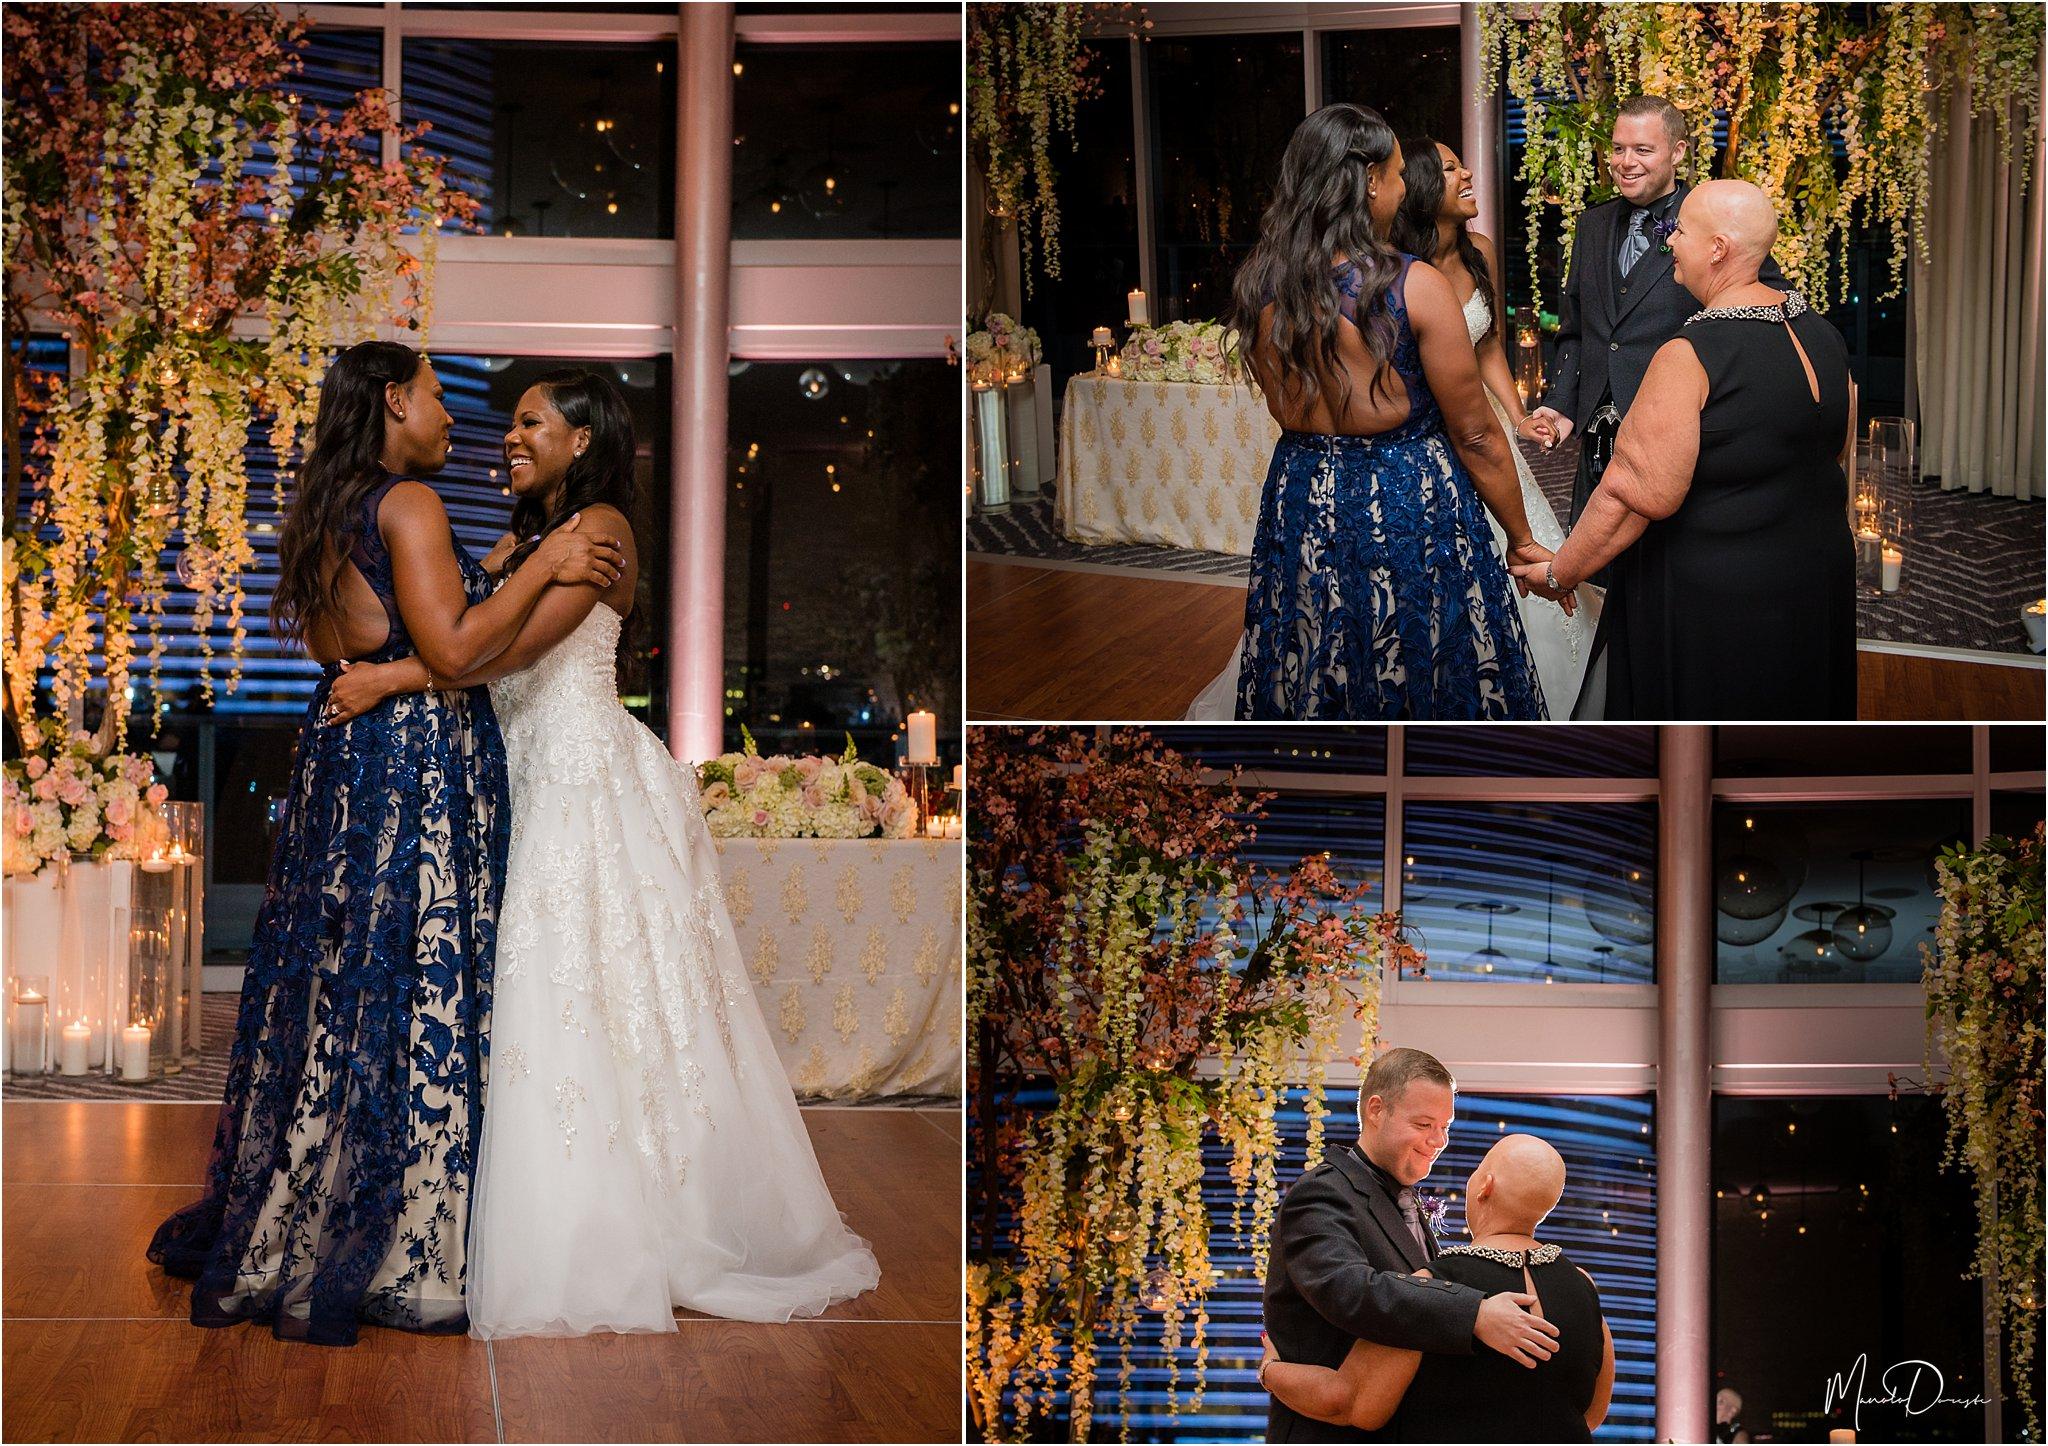 0129_ManoloDoreste_InFocusStudios_Wedding_Family_Photography_Miami_MiamiPhotographer.jpg